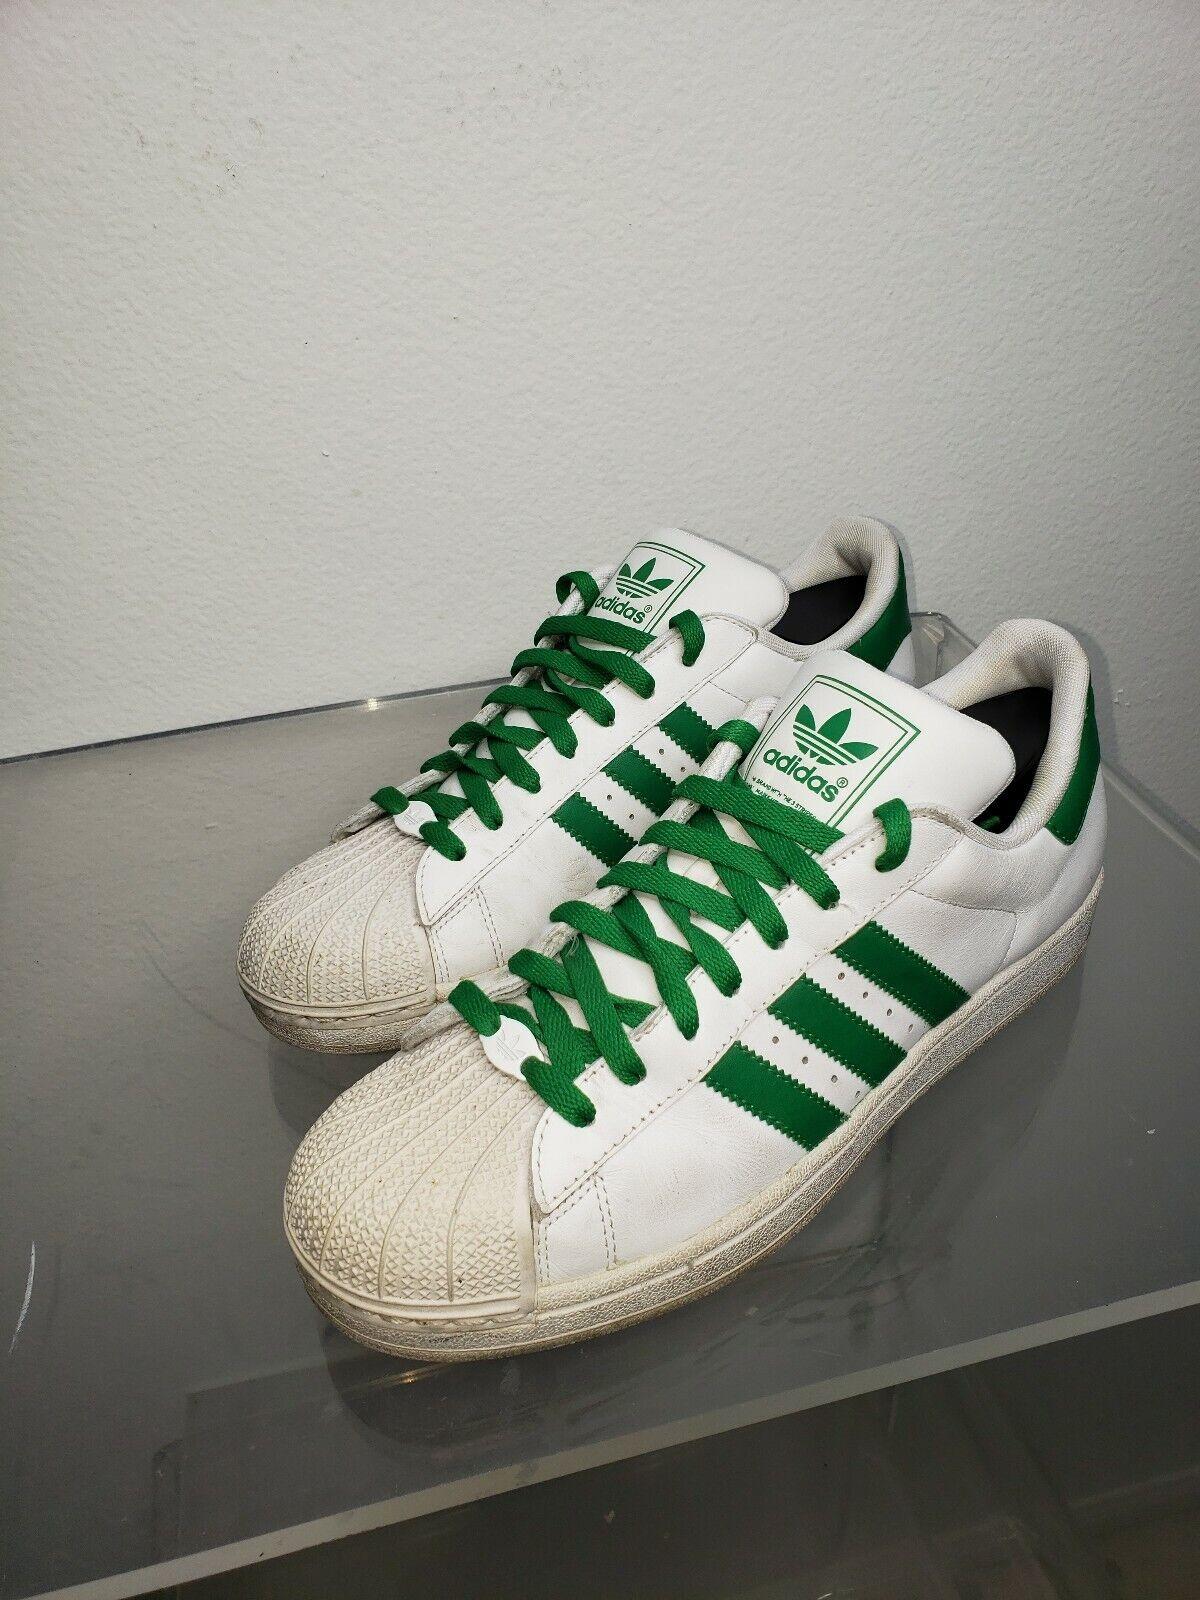 on sale 37d5a b78b0 Adidas Mens Shell Shell Shell Toe White Green PWL681-001 ...